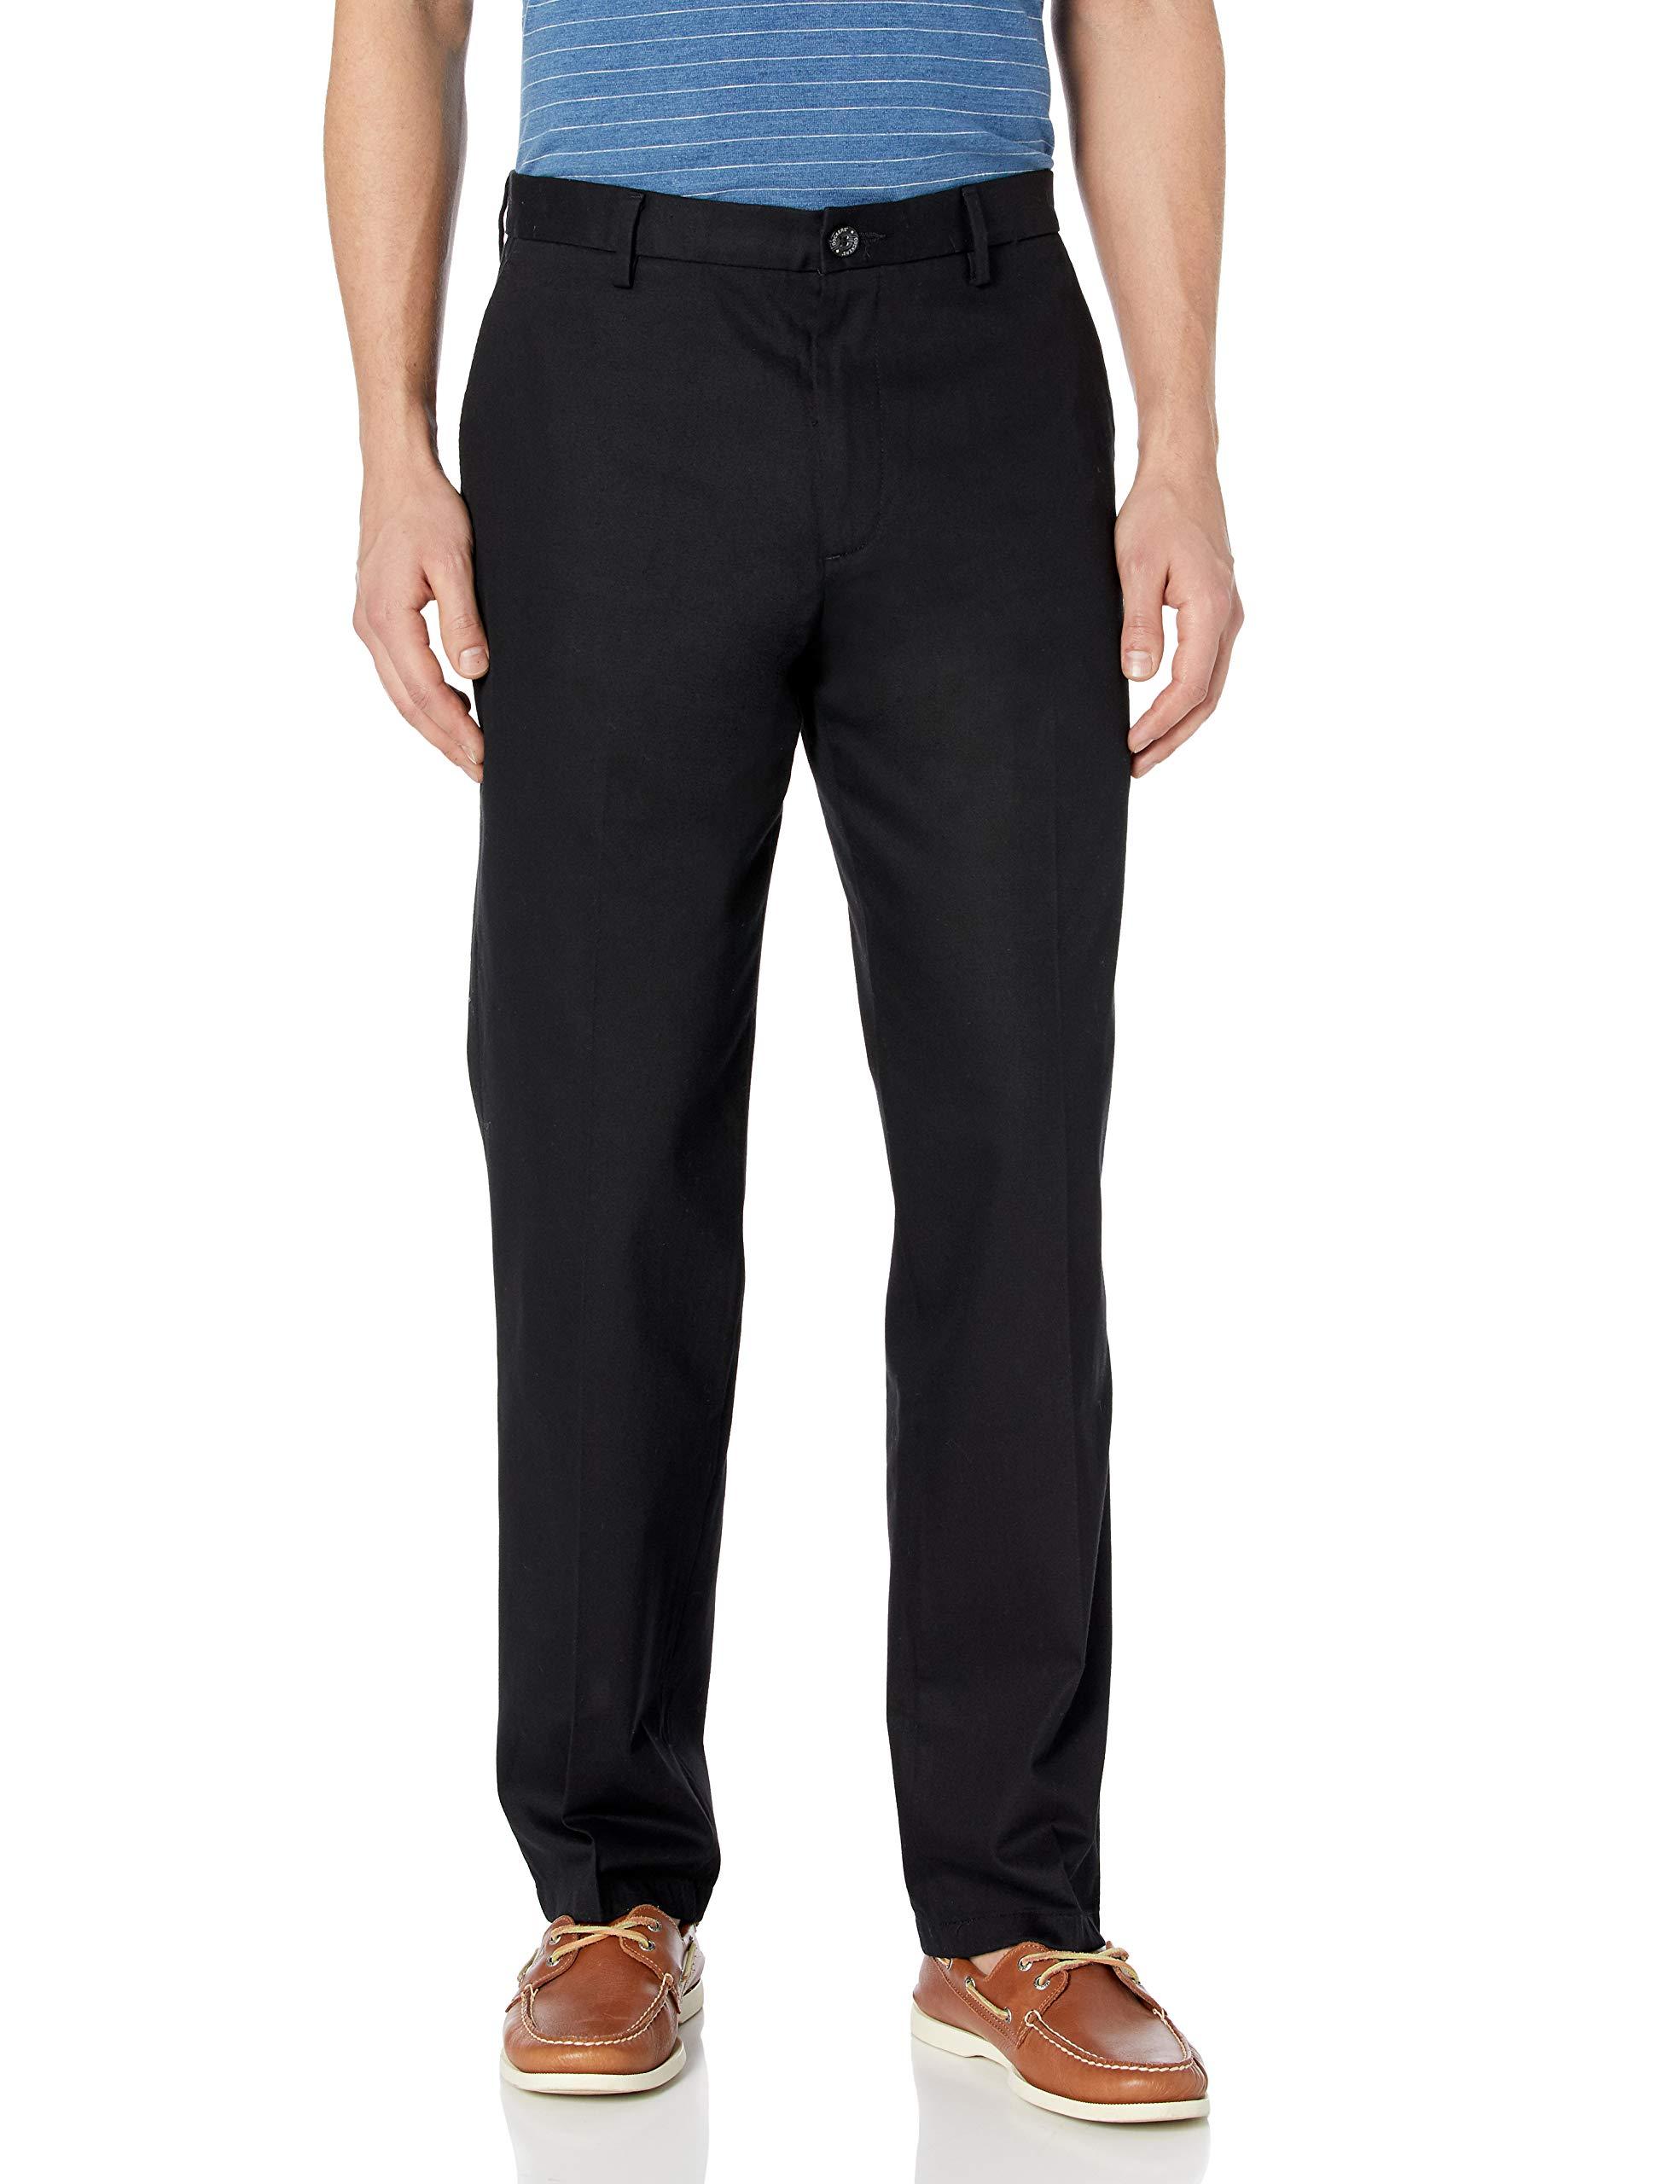 Dockers Men's Classic Fit Signature Khaki Pants D3